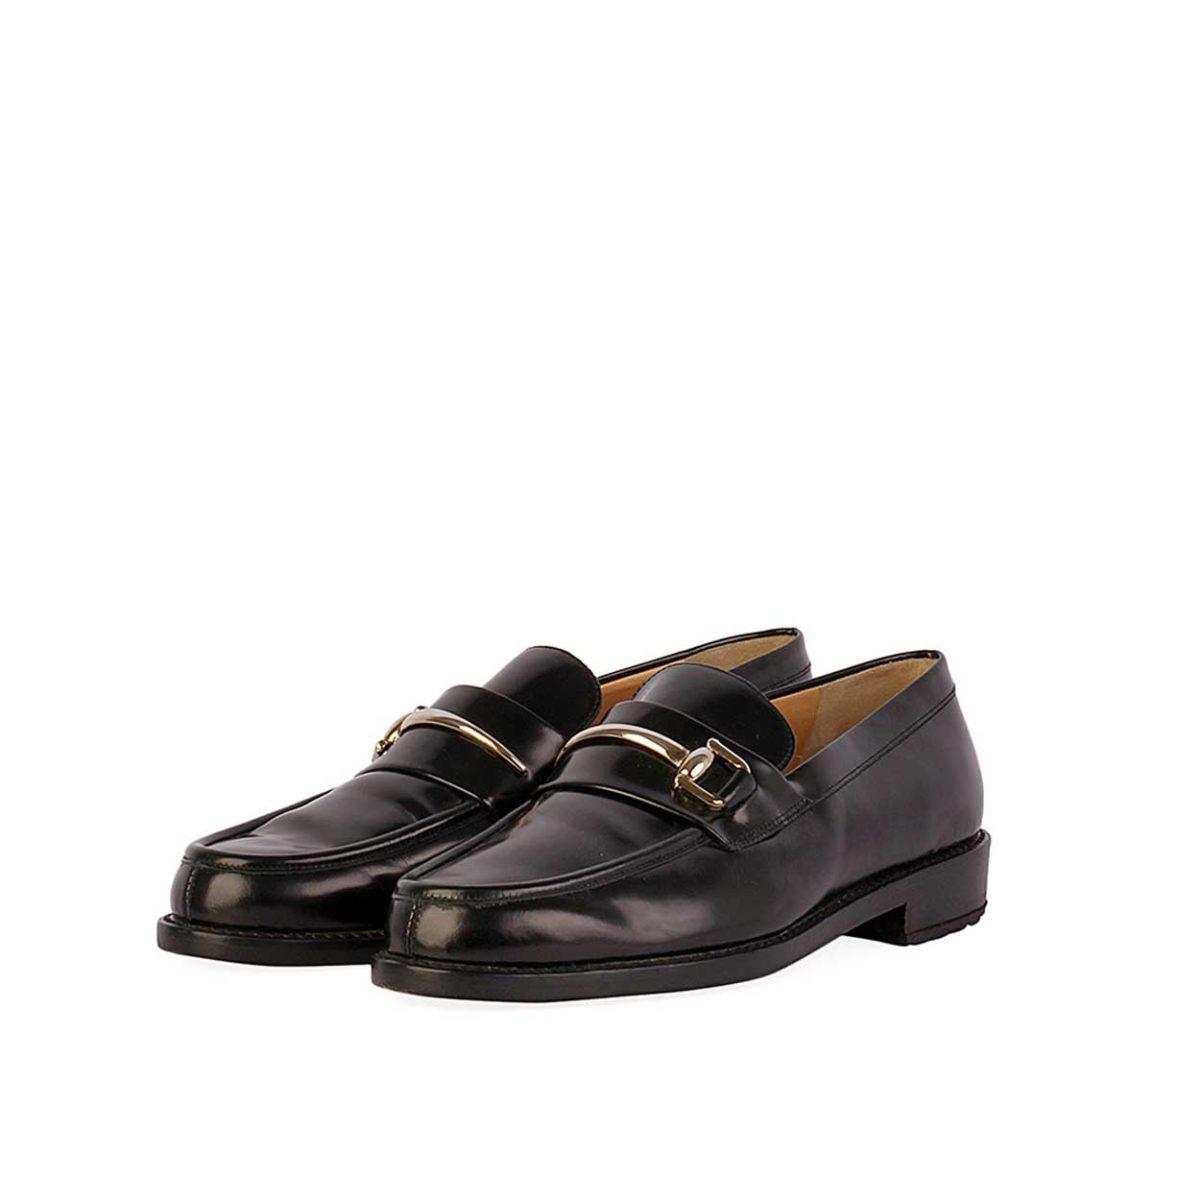 09fc2fdd28c GUCCI Horsebit Leather Loafers Black – S  35.5 (2.5)